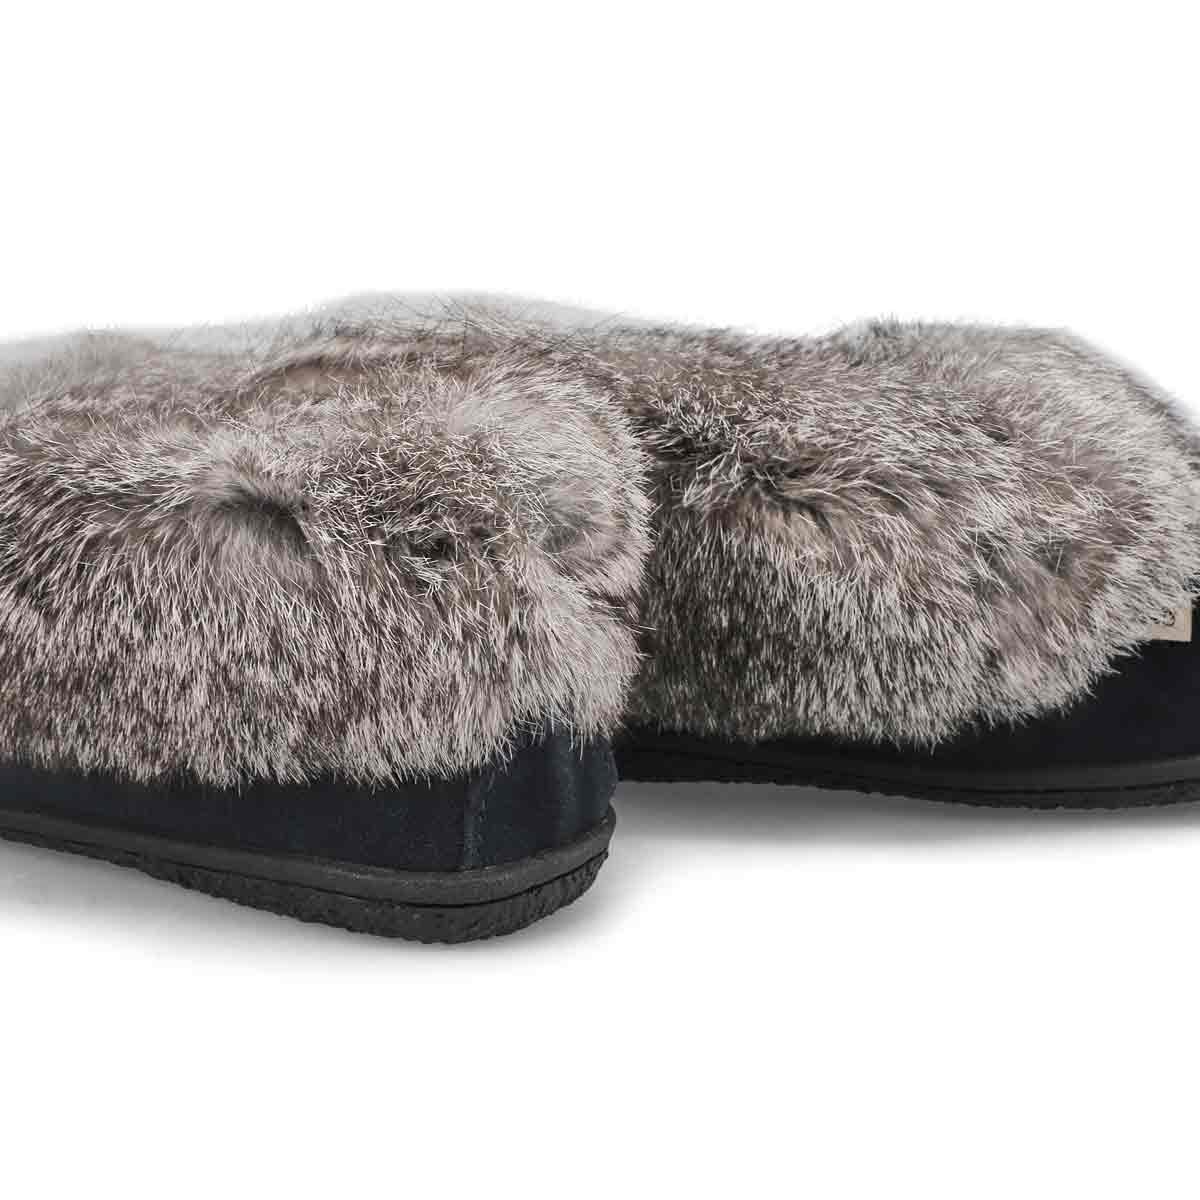 Women's Cute 5 Rabbit Fur Moccasin - Navy